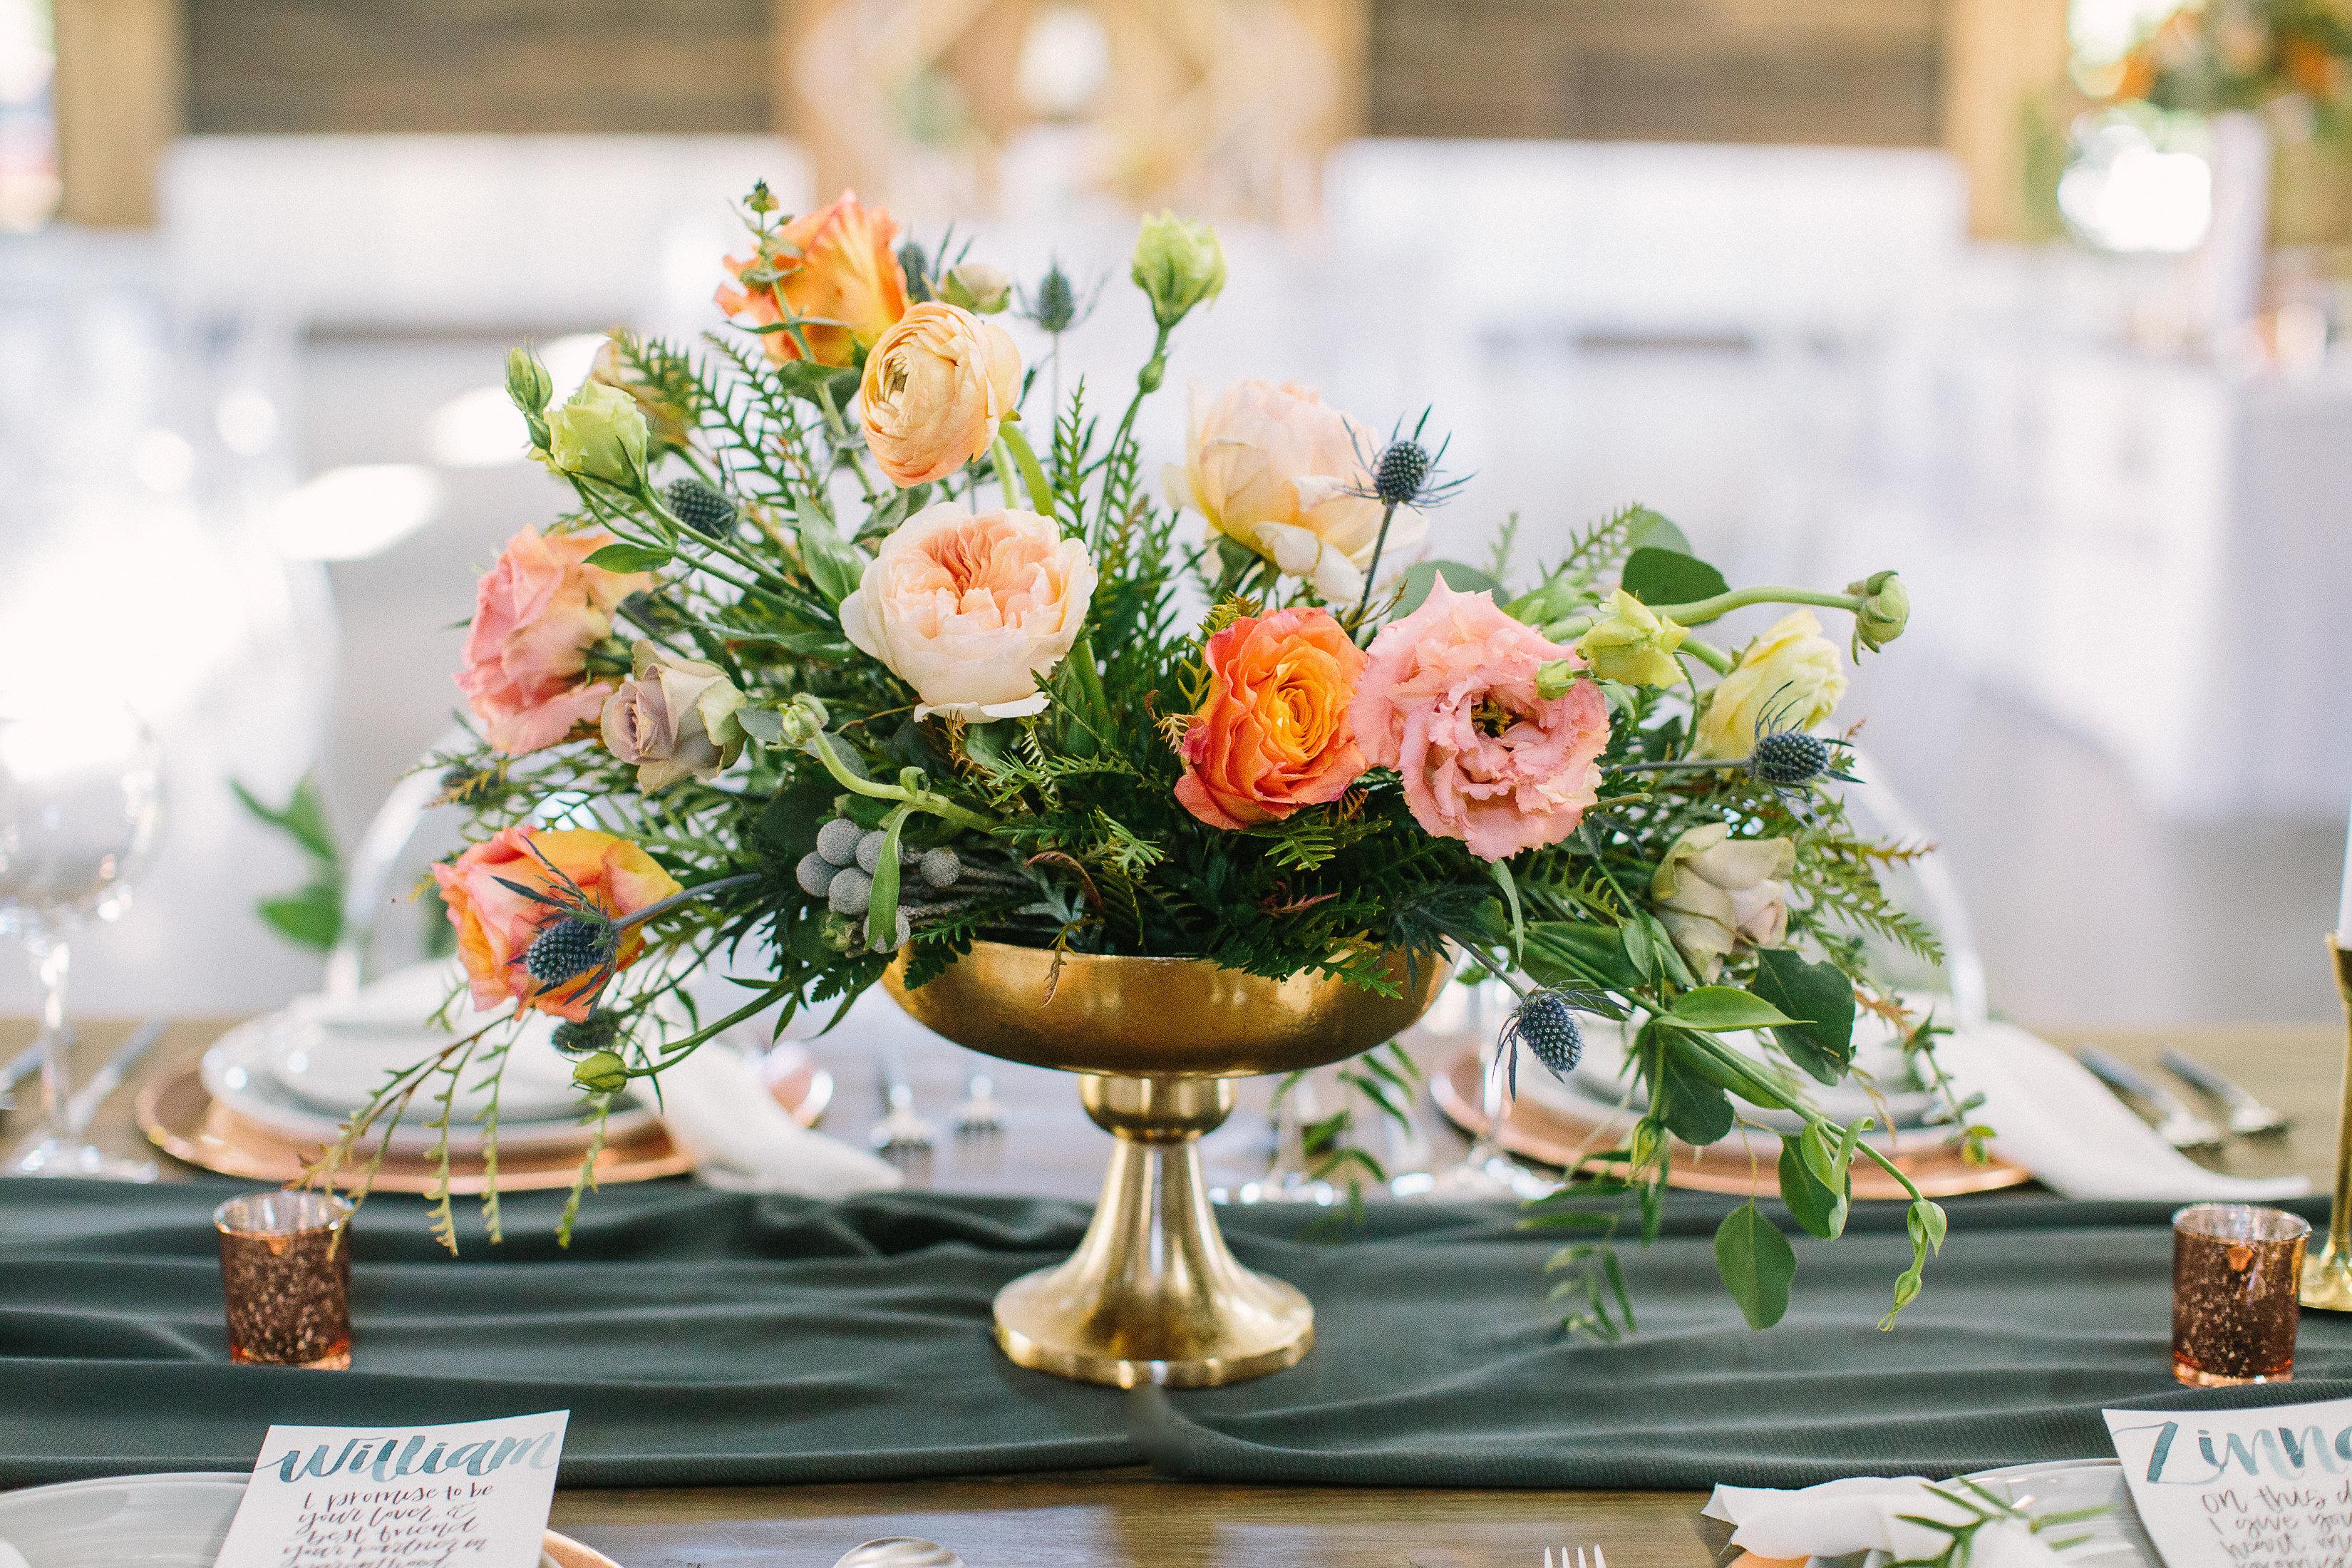 Ellen-Ashton-Photography-Peach-Creek-Ranch-Weddings-Wed-and-Prosper100